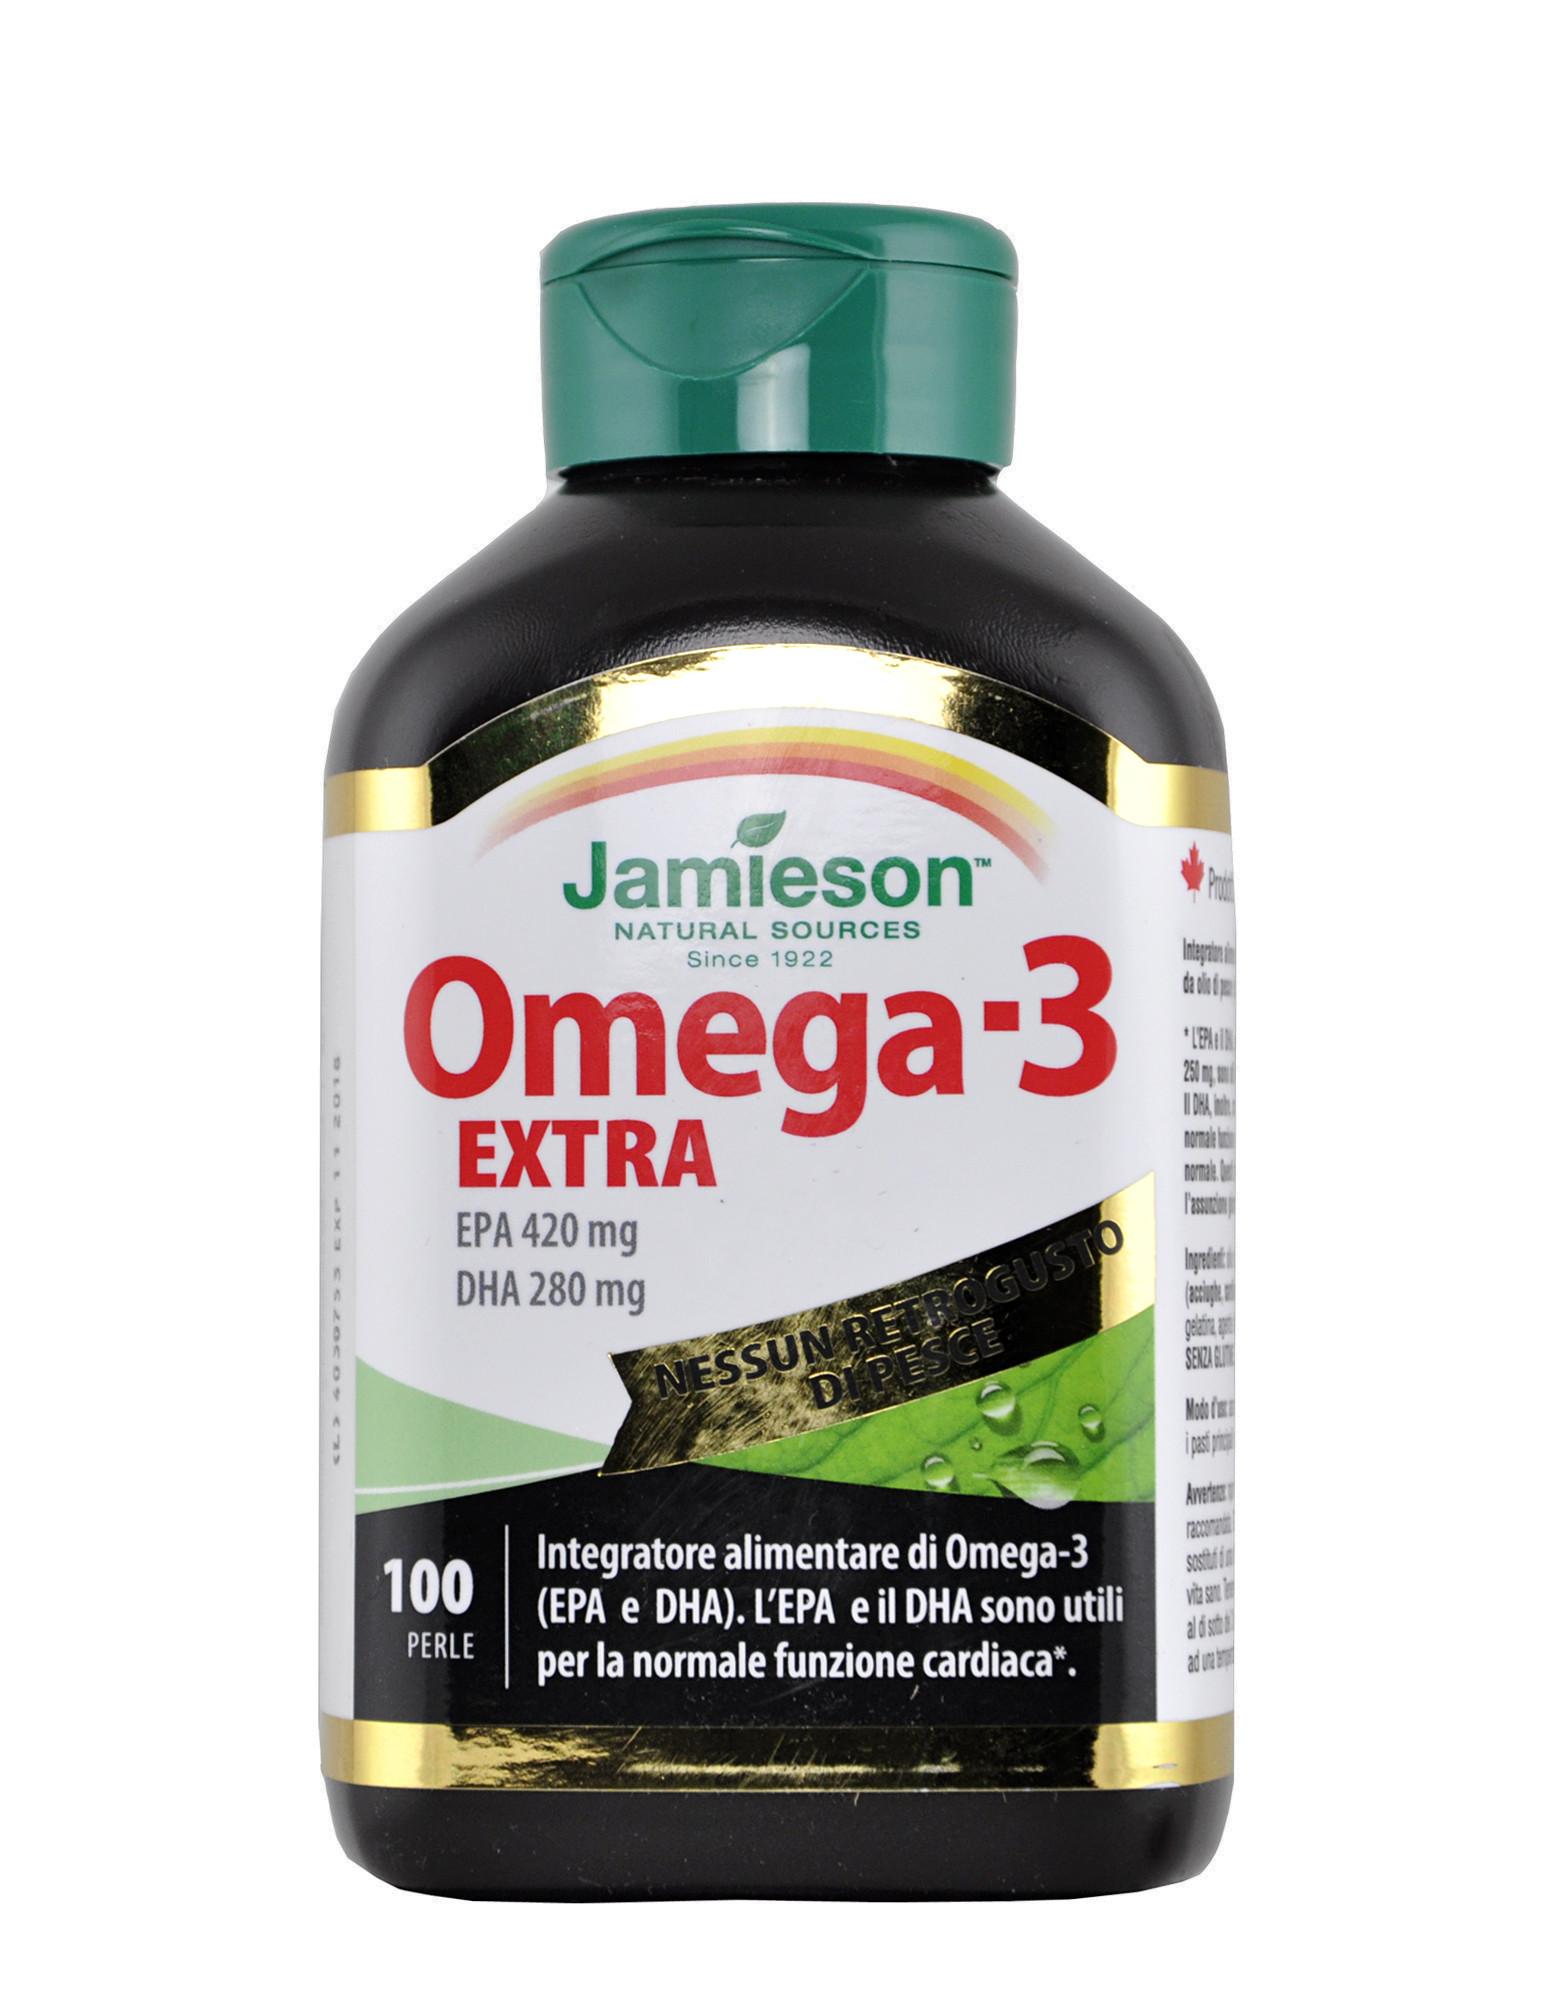 jamieson omega 3  Omega-3 Extra di JAMIESON (100 perle)